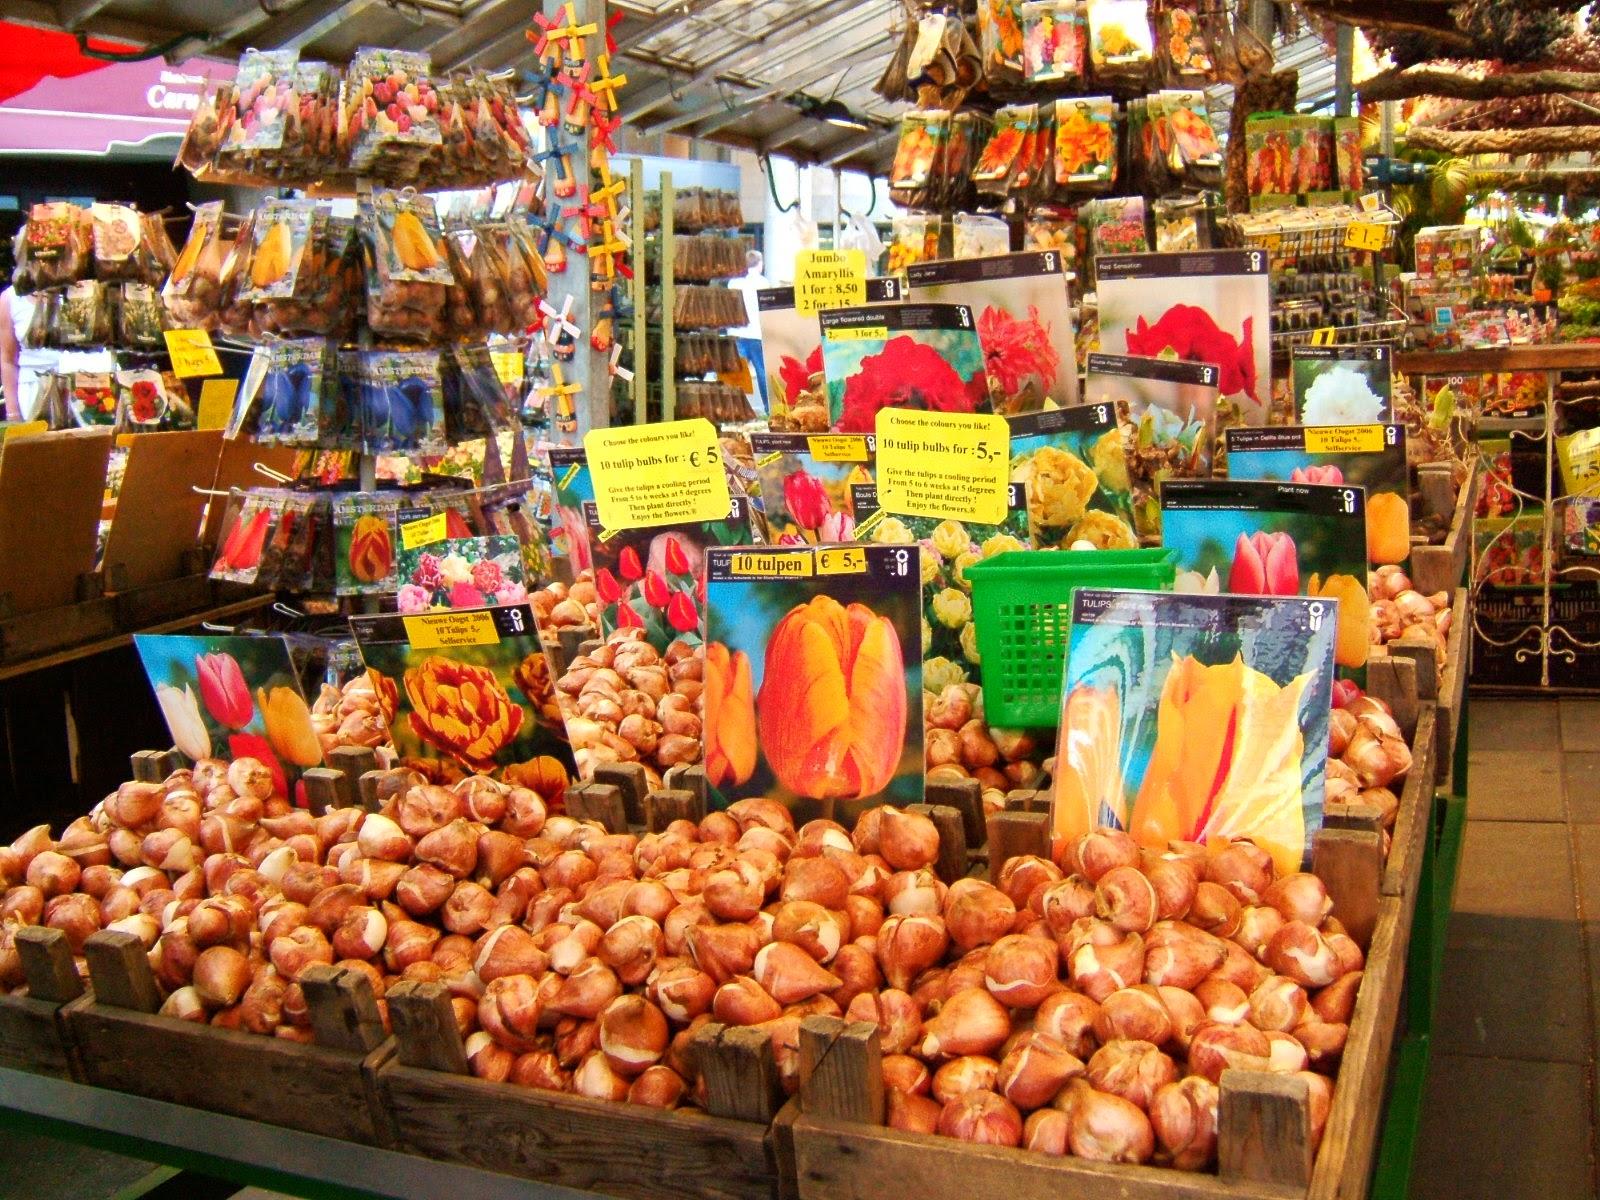 Амстердам, Цветочный рынок. Фото: ms.Tea/Wikimedia.